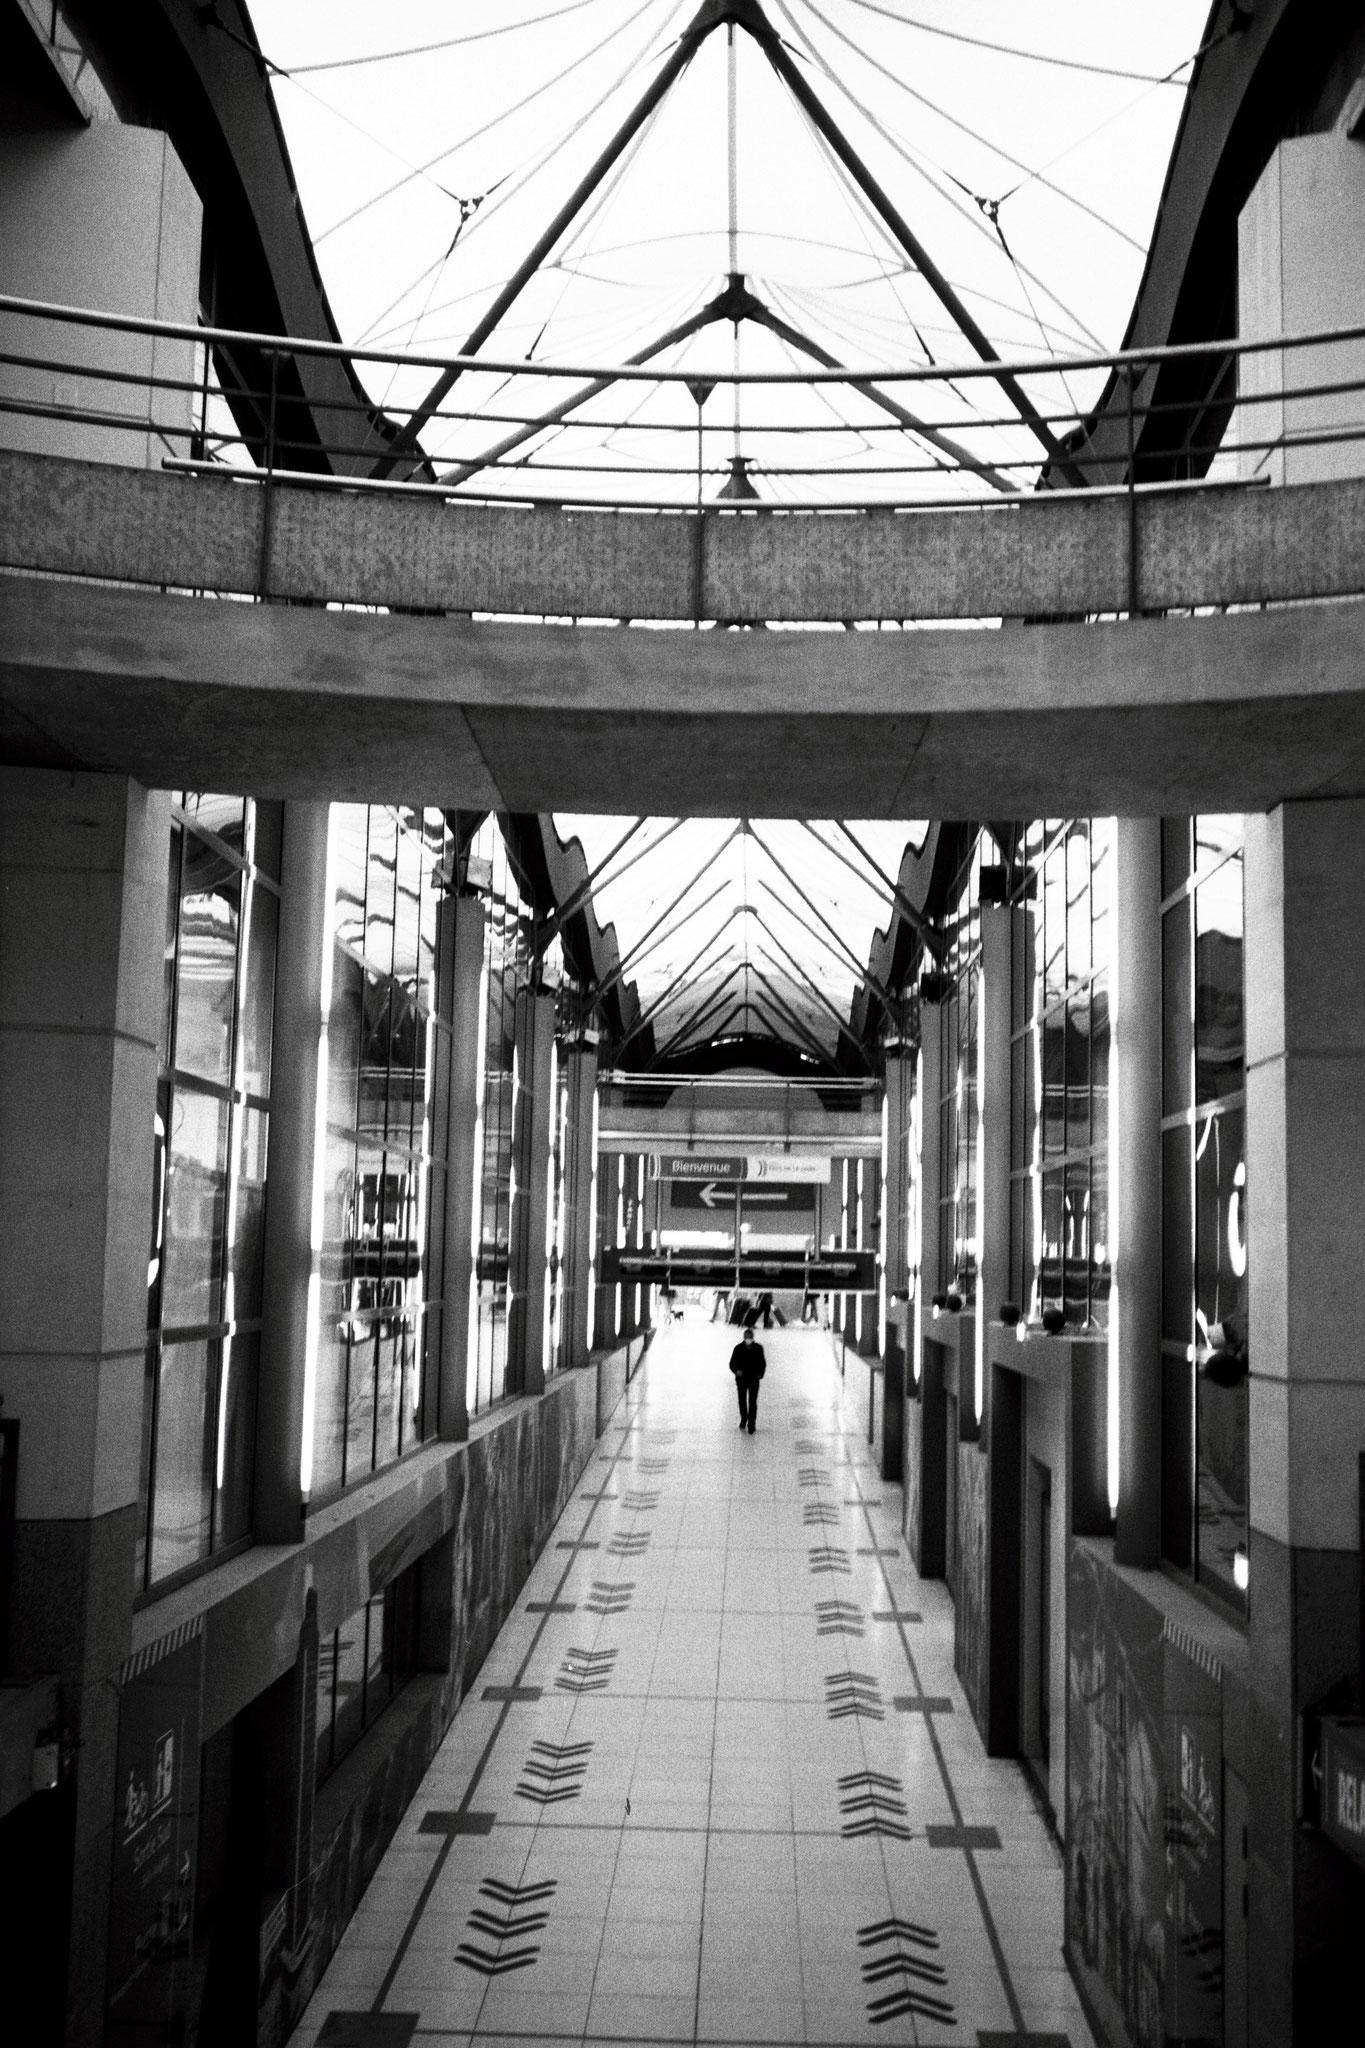 """Secret gateway"" - Gare de Nantes (2021). Rollei Superpan 200 ASA. © Clémence Rougetet"